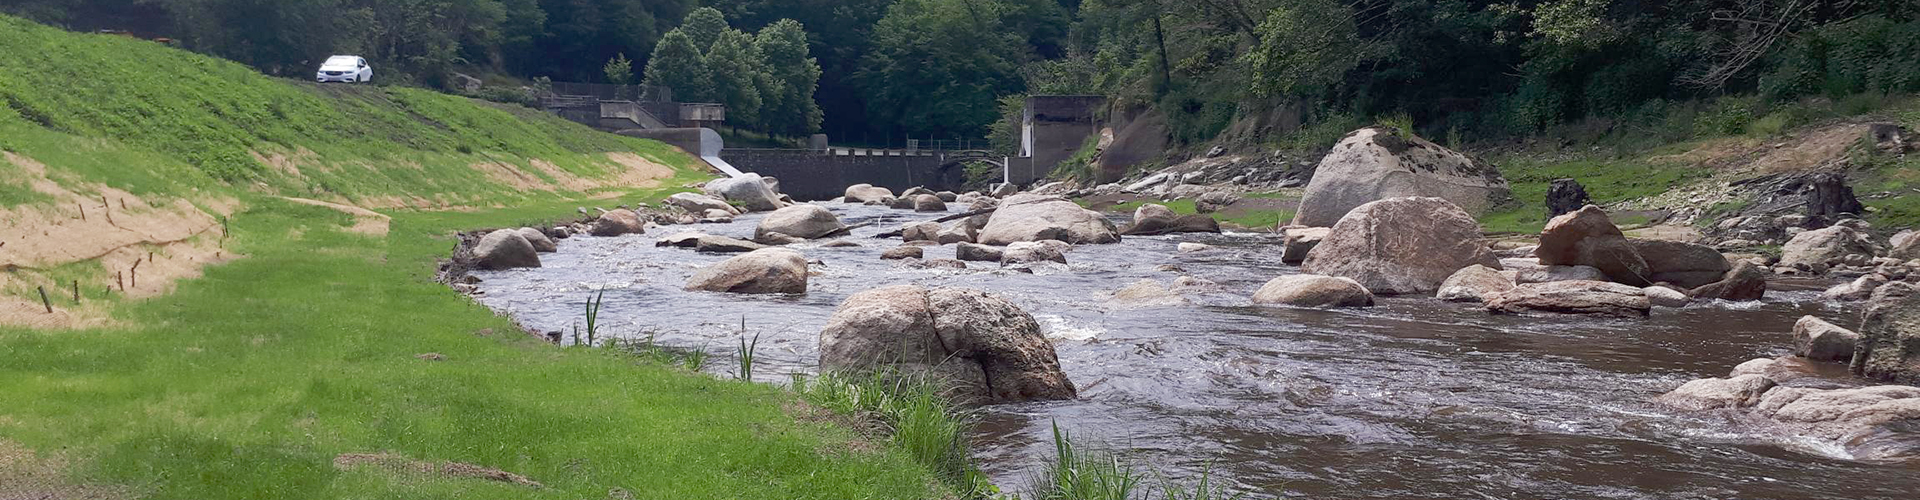 Entretien et restauration des berges